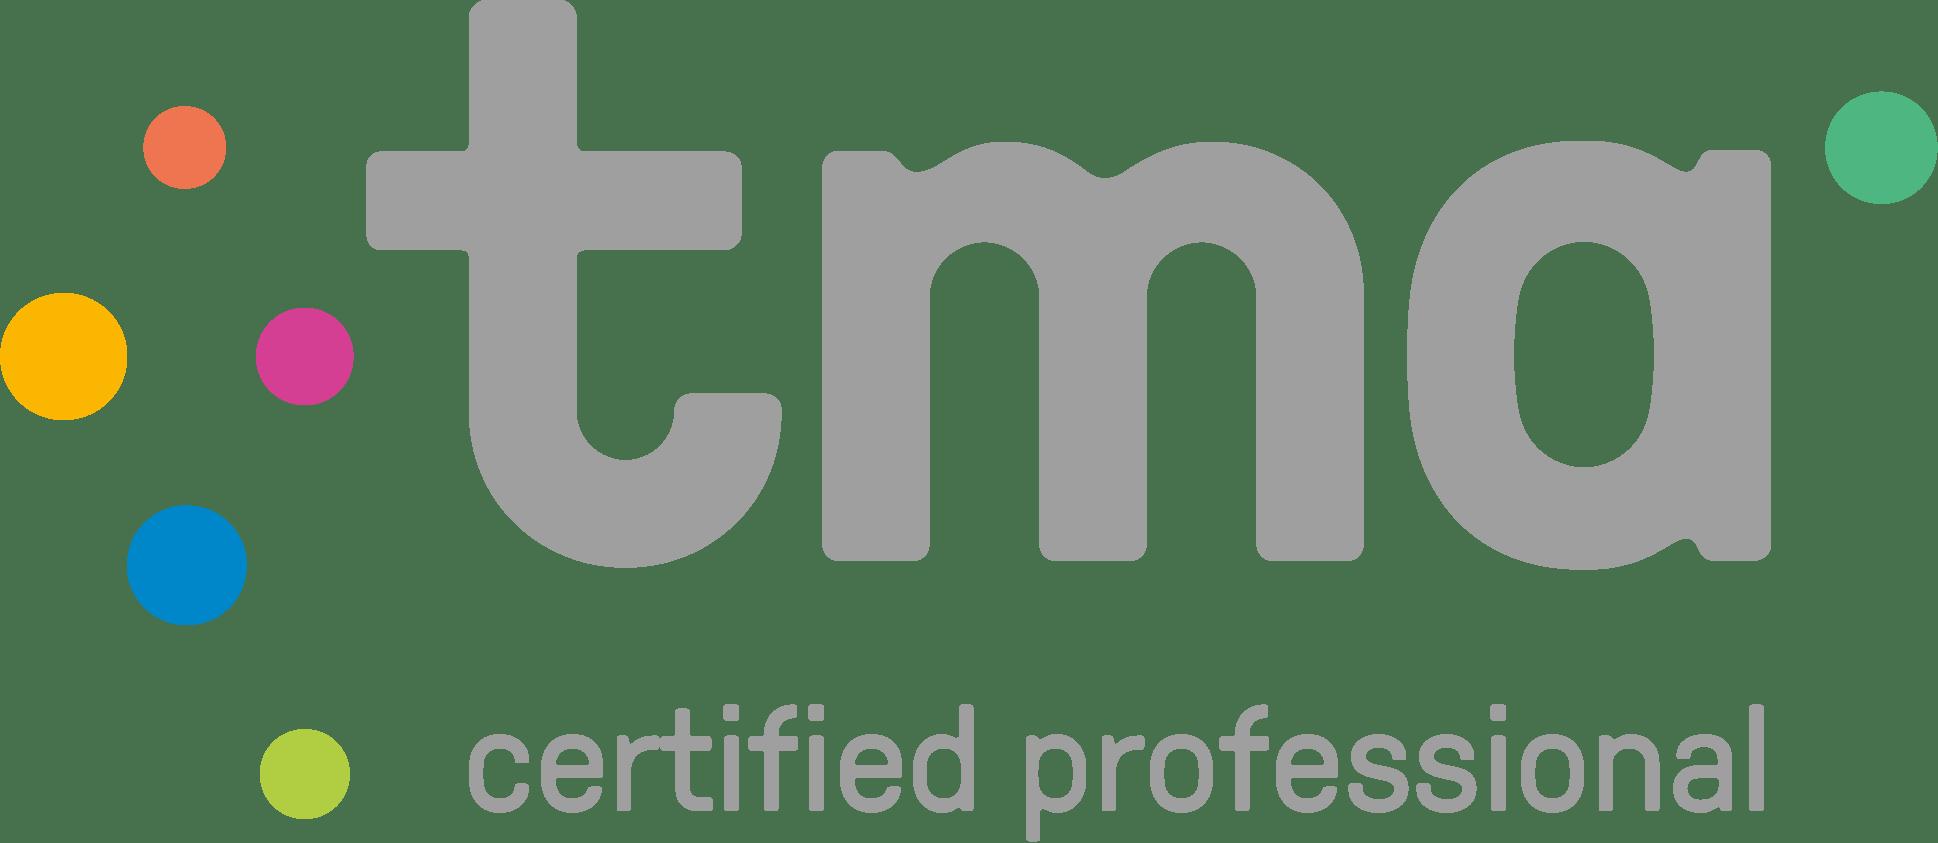 tma-certifiedprofessional-logo_1_20210115_153754